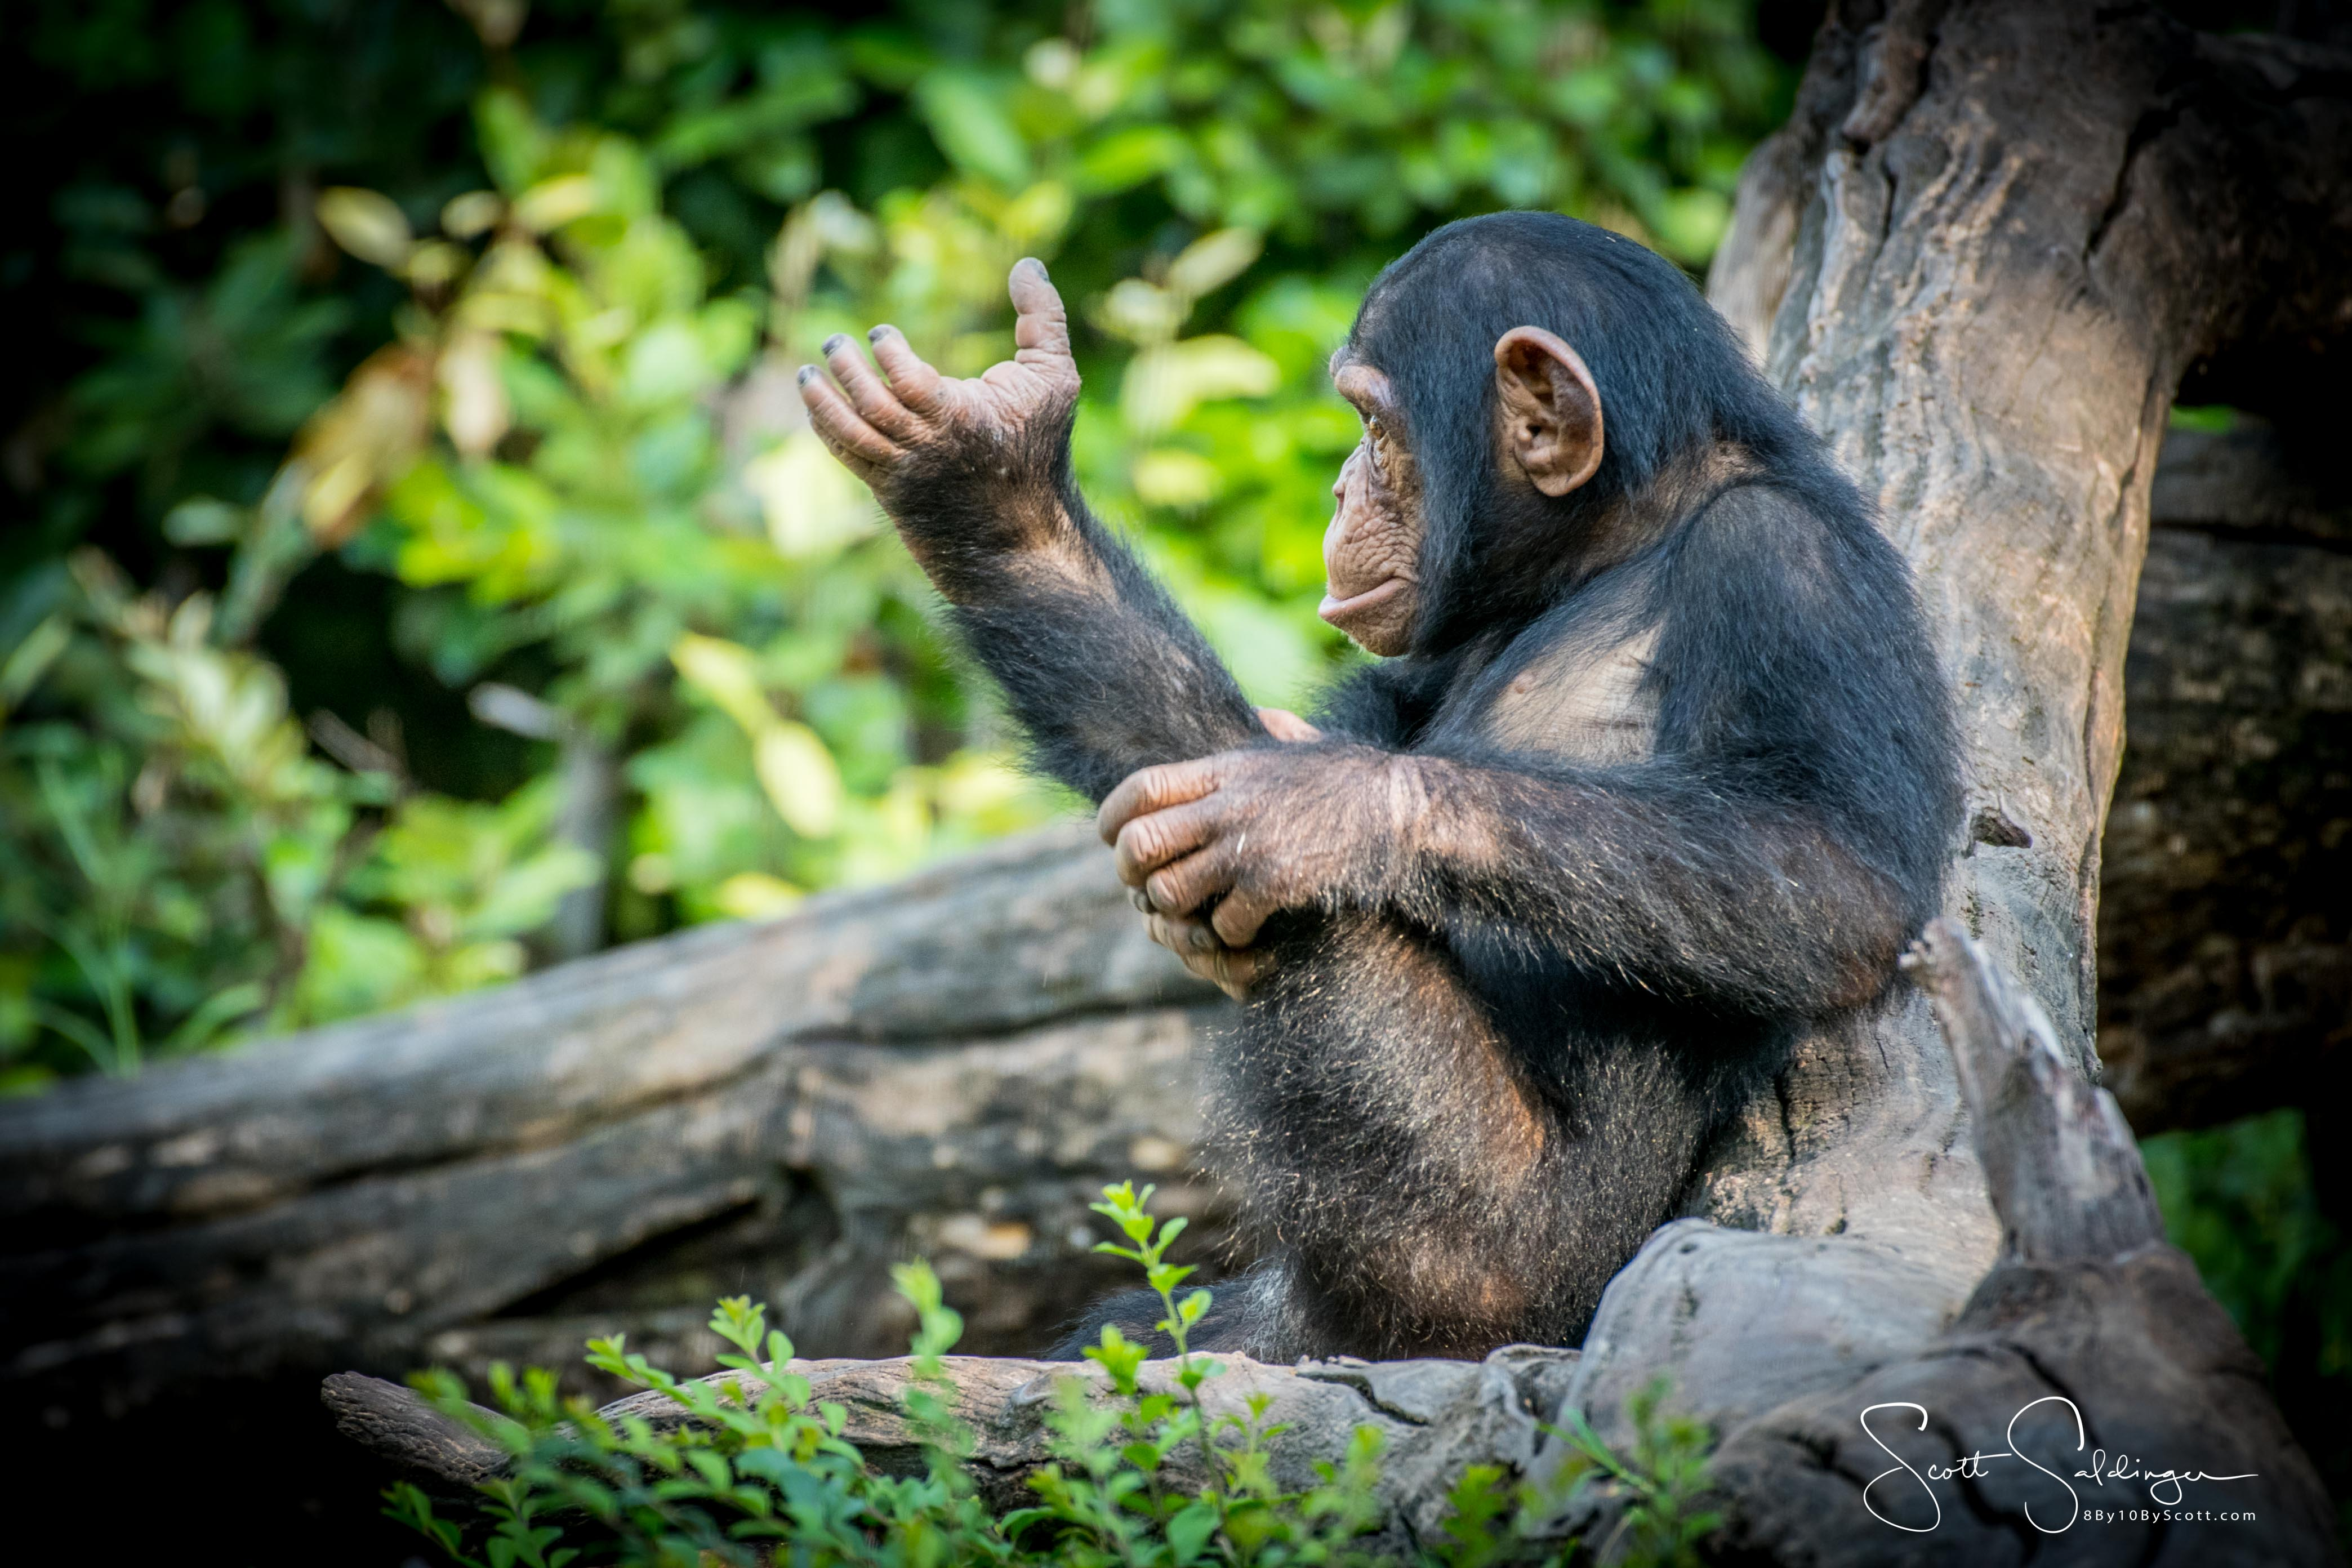 Apes-6100